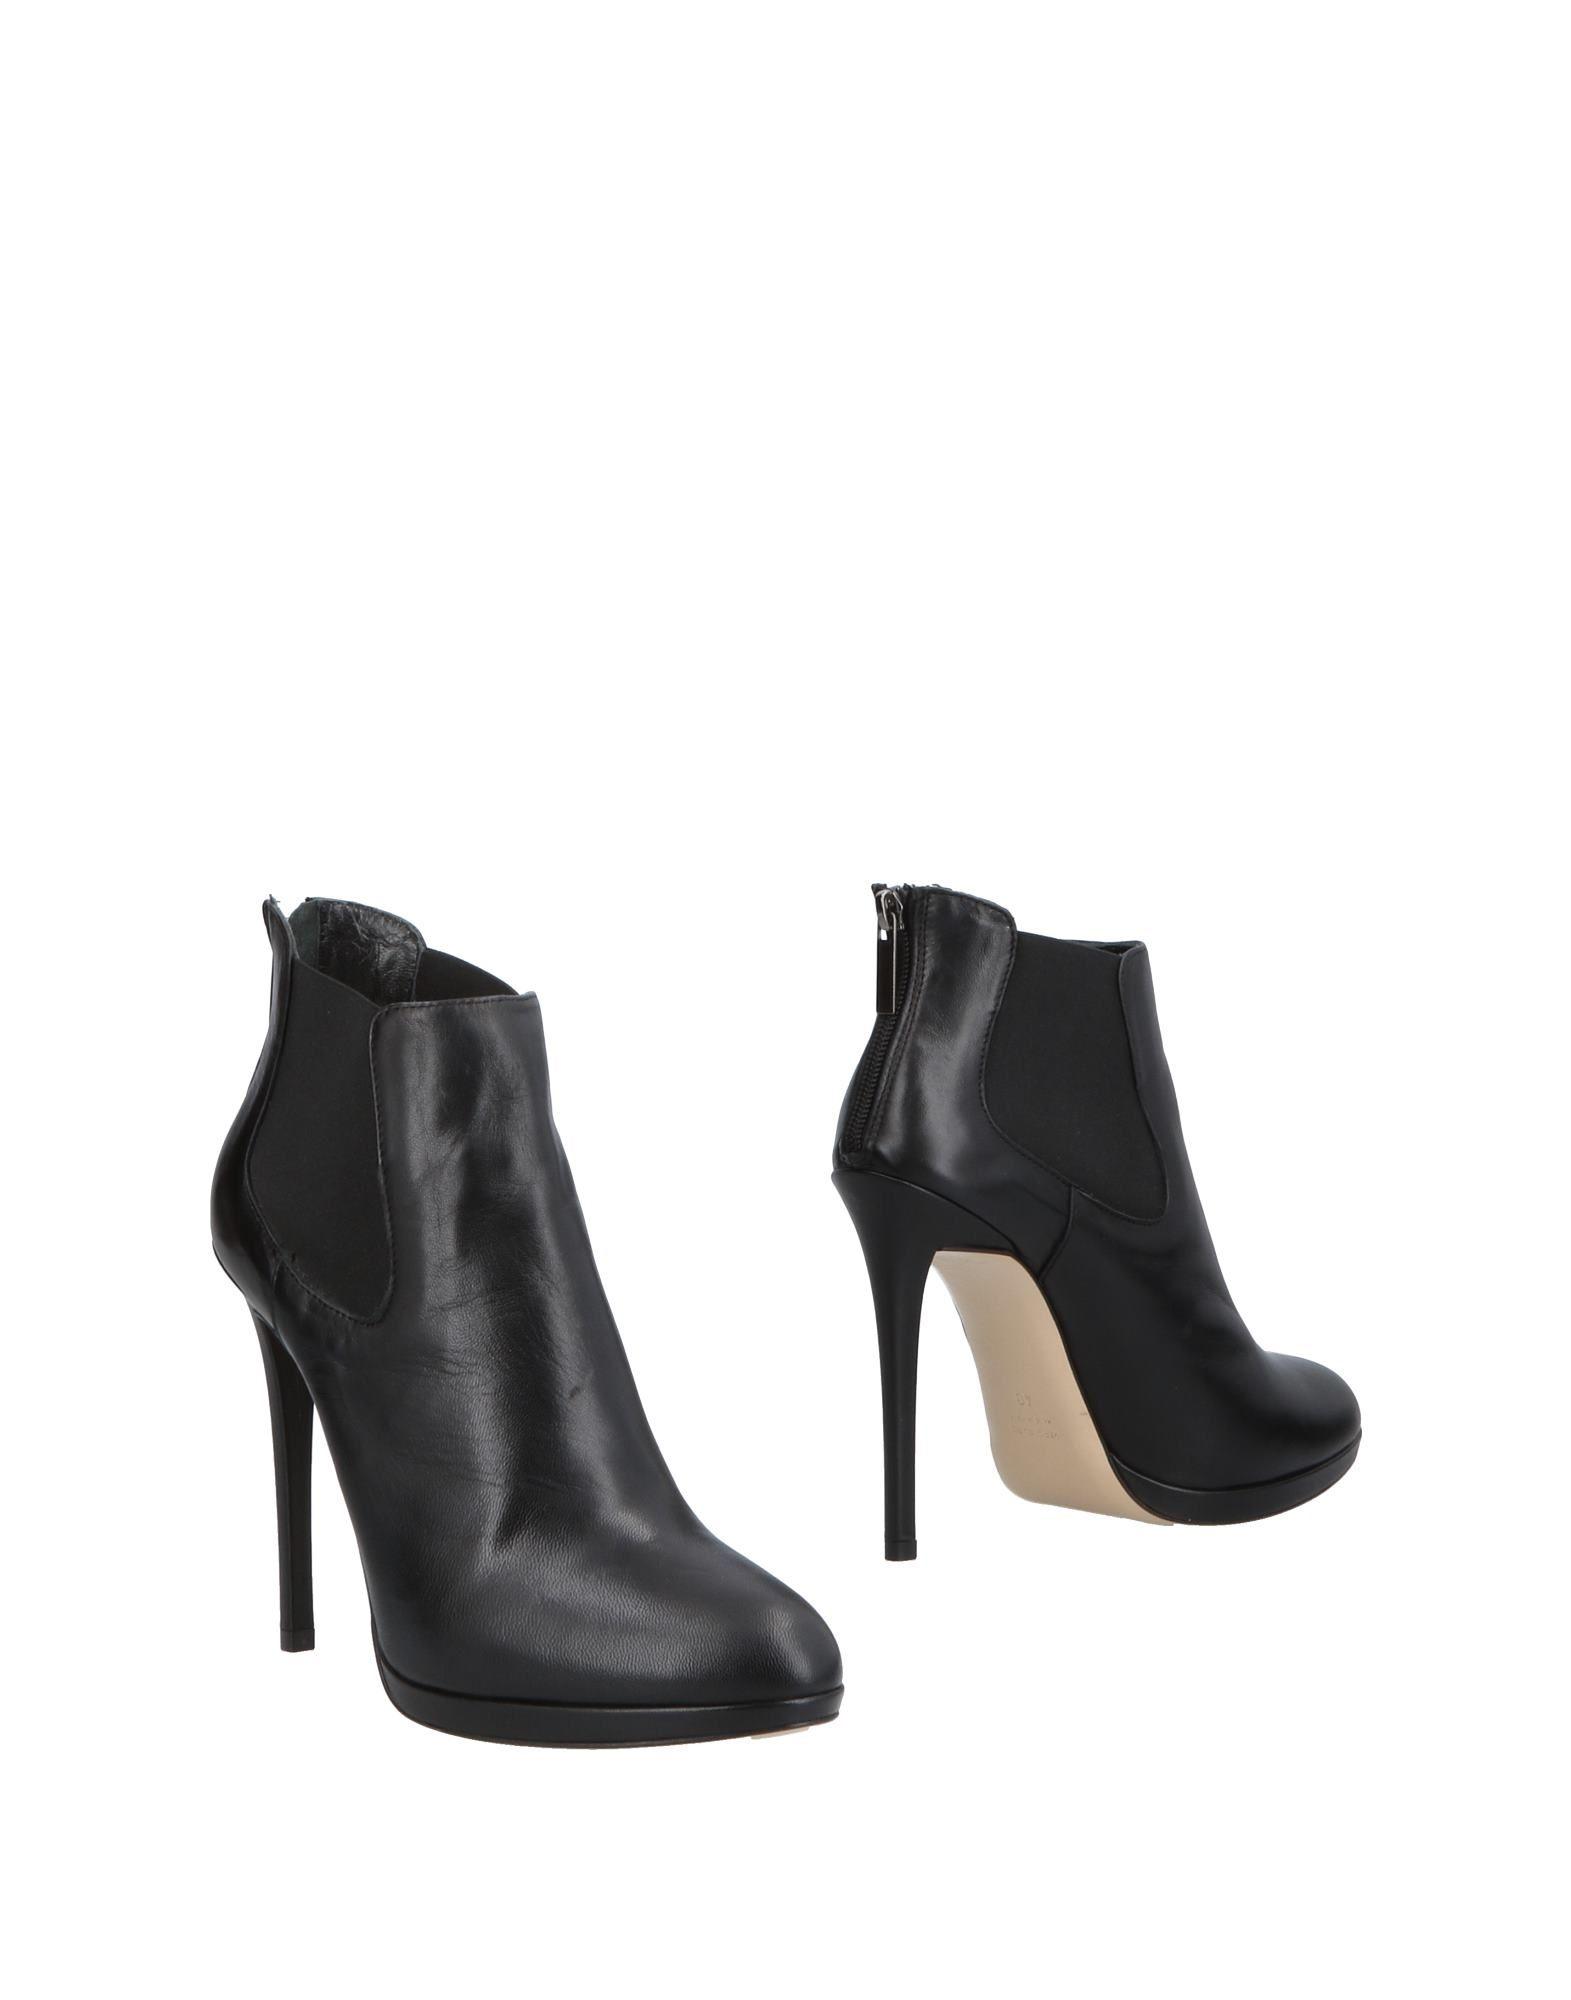 Giampaolo Viozzi Stiefelette Damen  11506747LJ Gute Qualität beliebte Schuhe